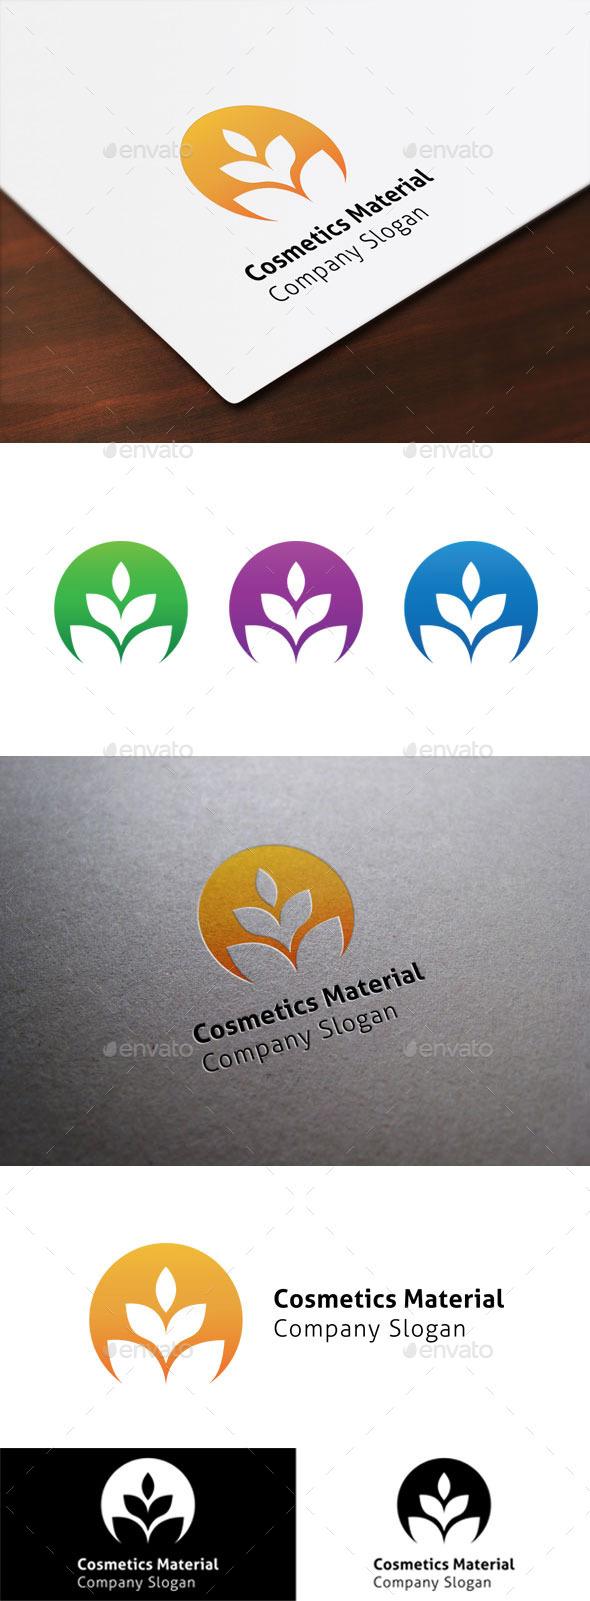 GraphicRiver Cosmetics Material logo 9380353